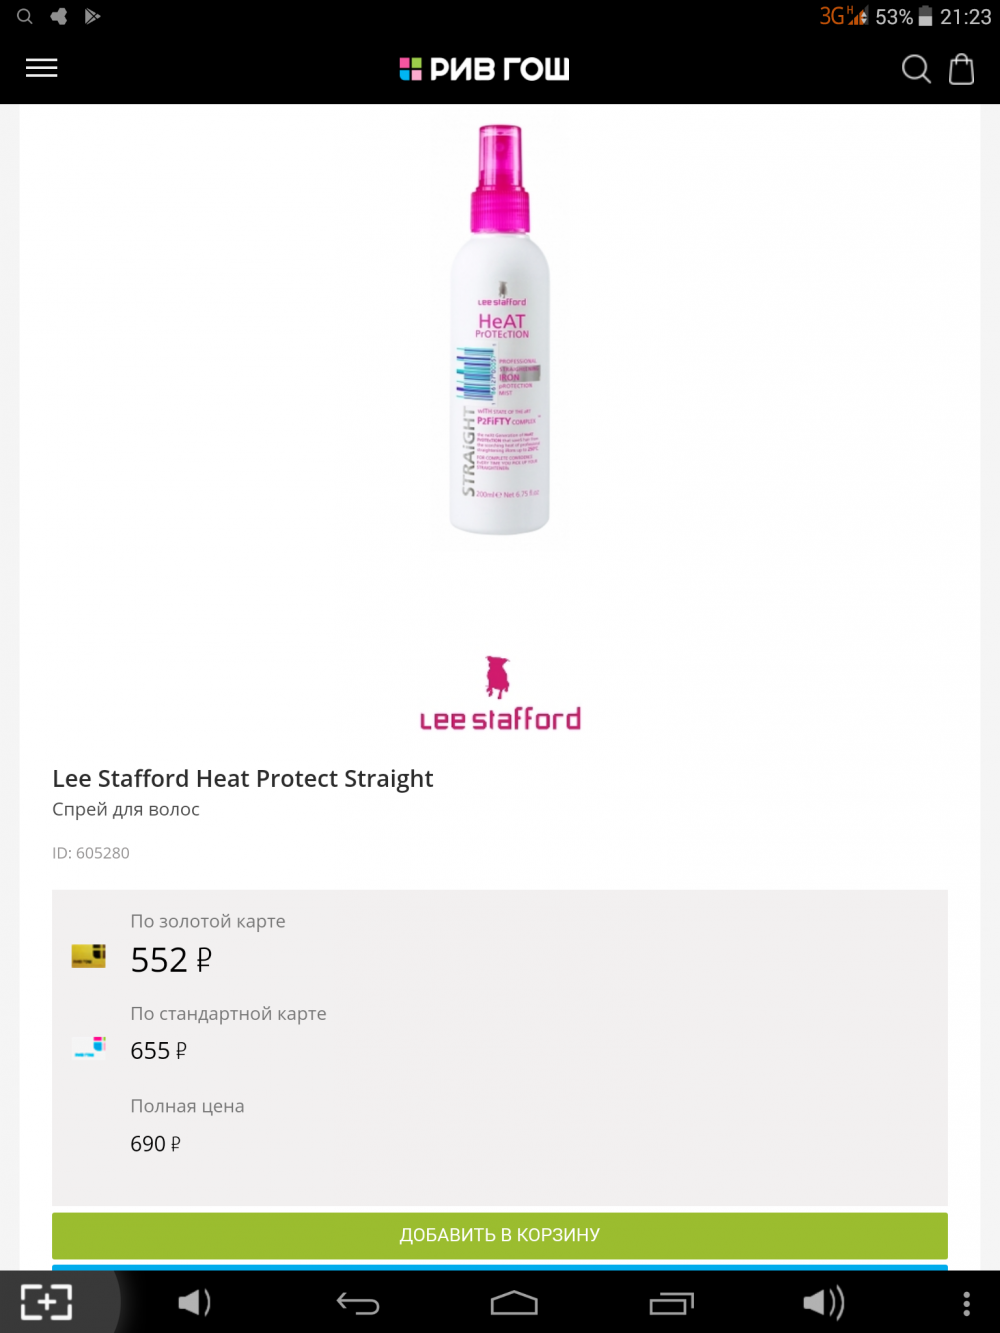 Спрей для волос, Lee Stafford Heat Protect Straight, 200мл